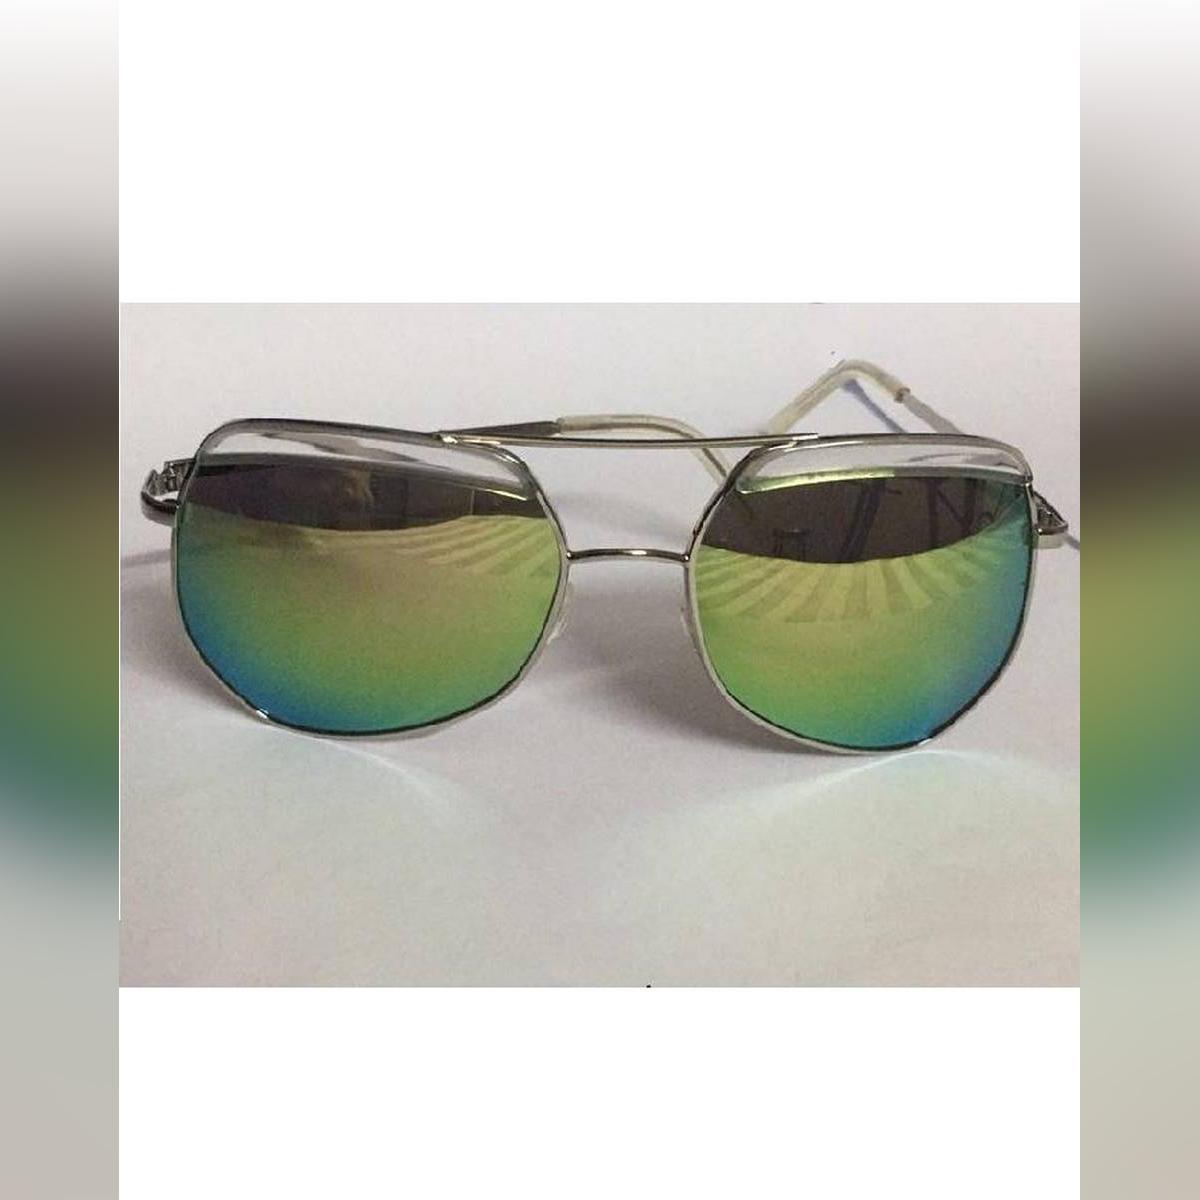 Shades Green Mirror Fashionable Sunglasses Eye Sun Glasses